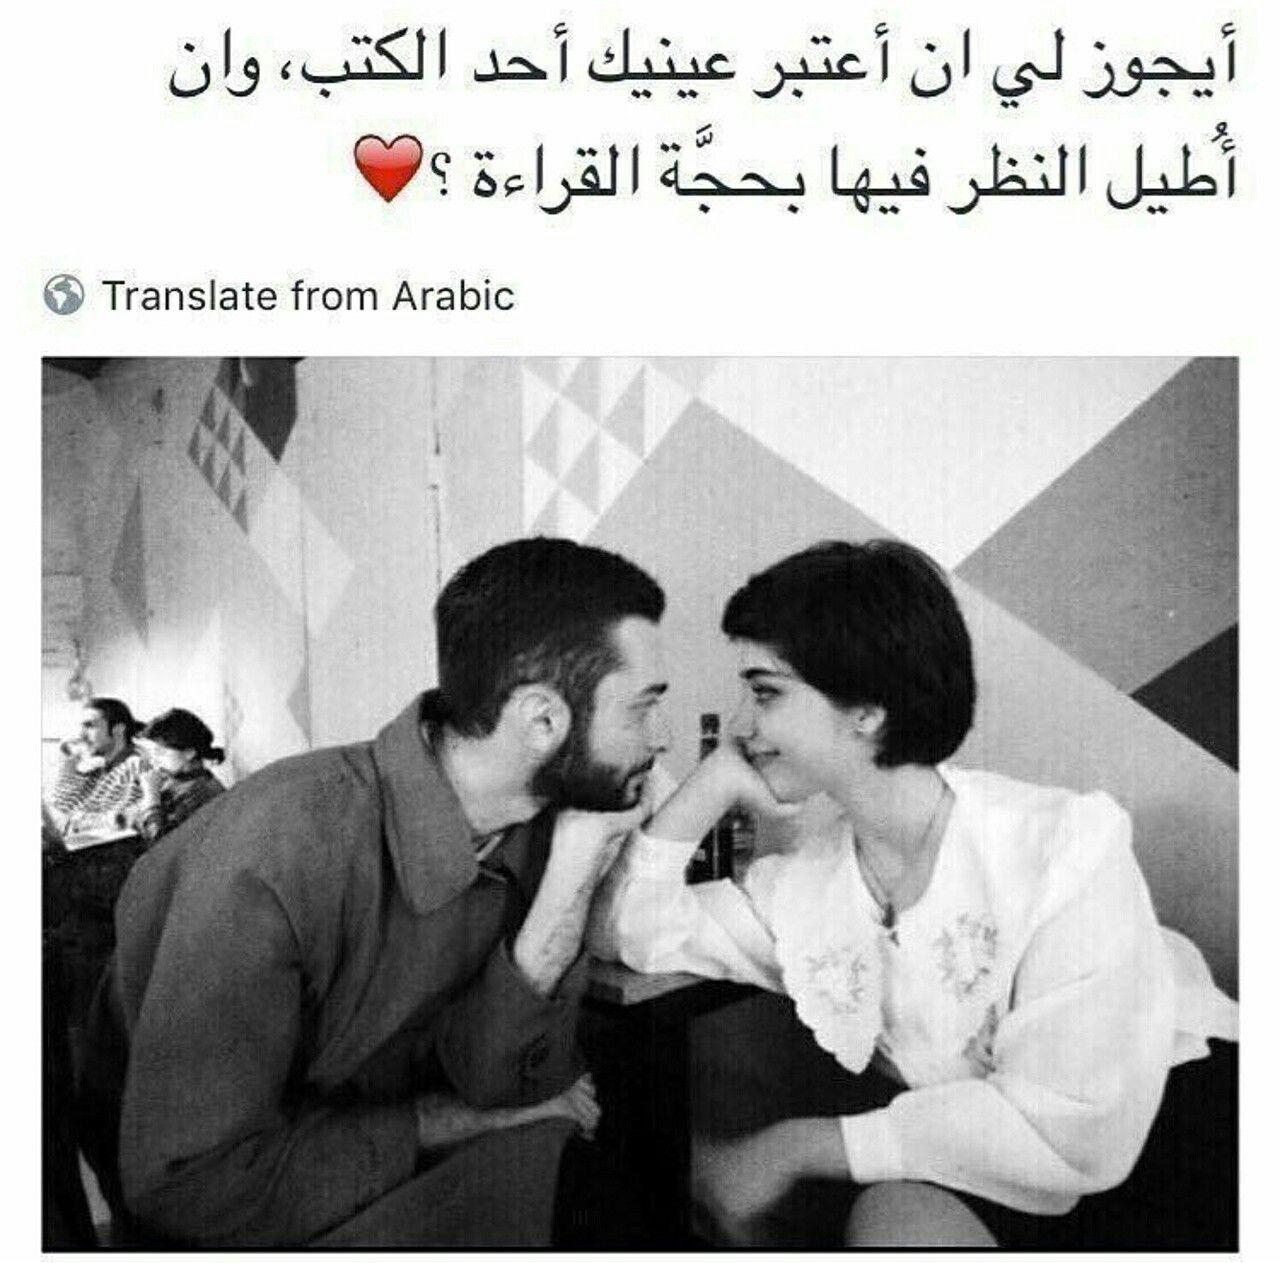 Pin by Sun libya on بوح الكلمات Beautiful words, Words